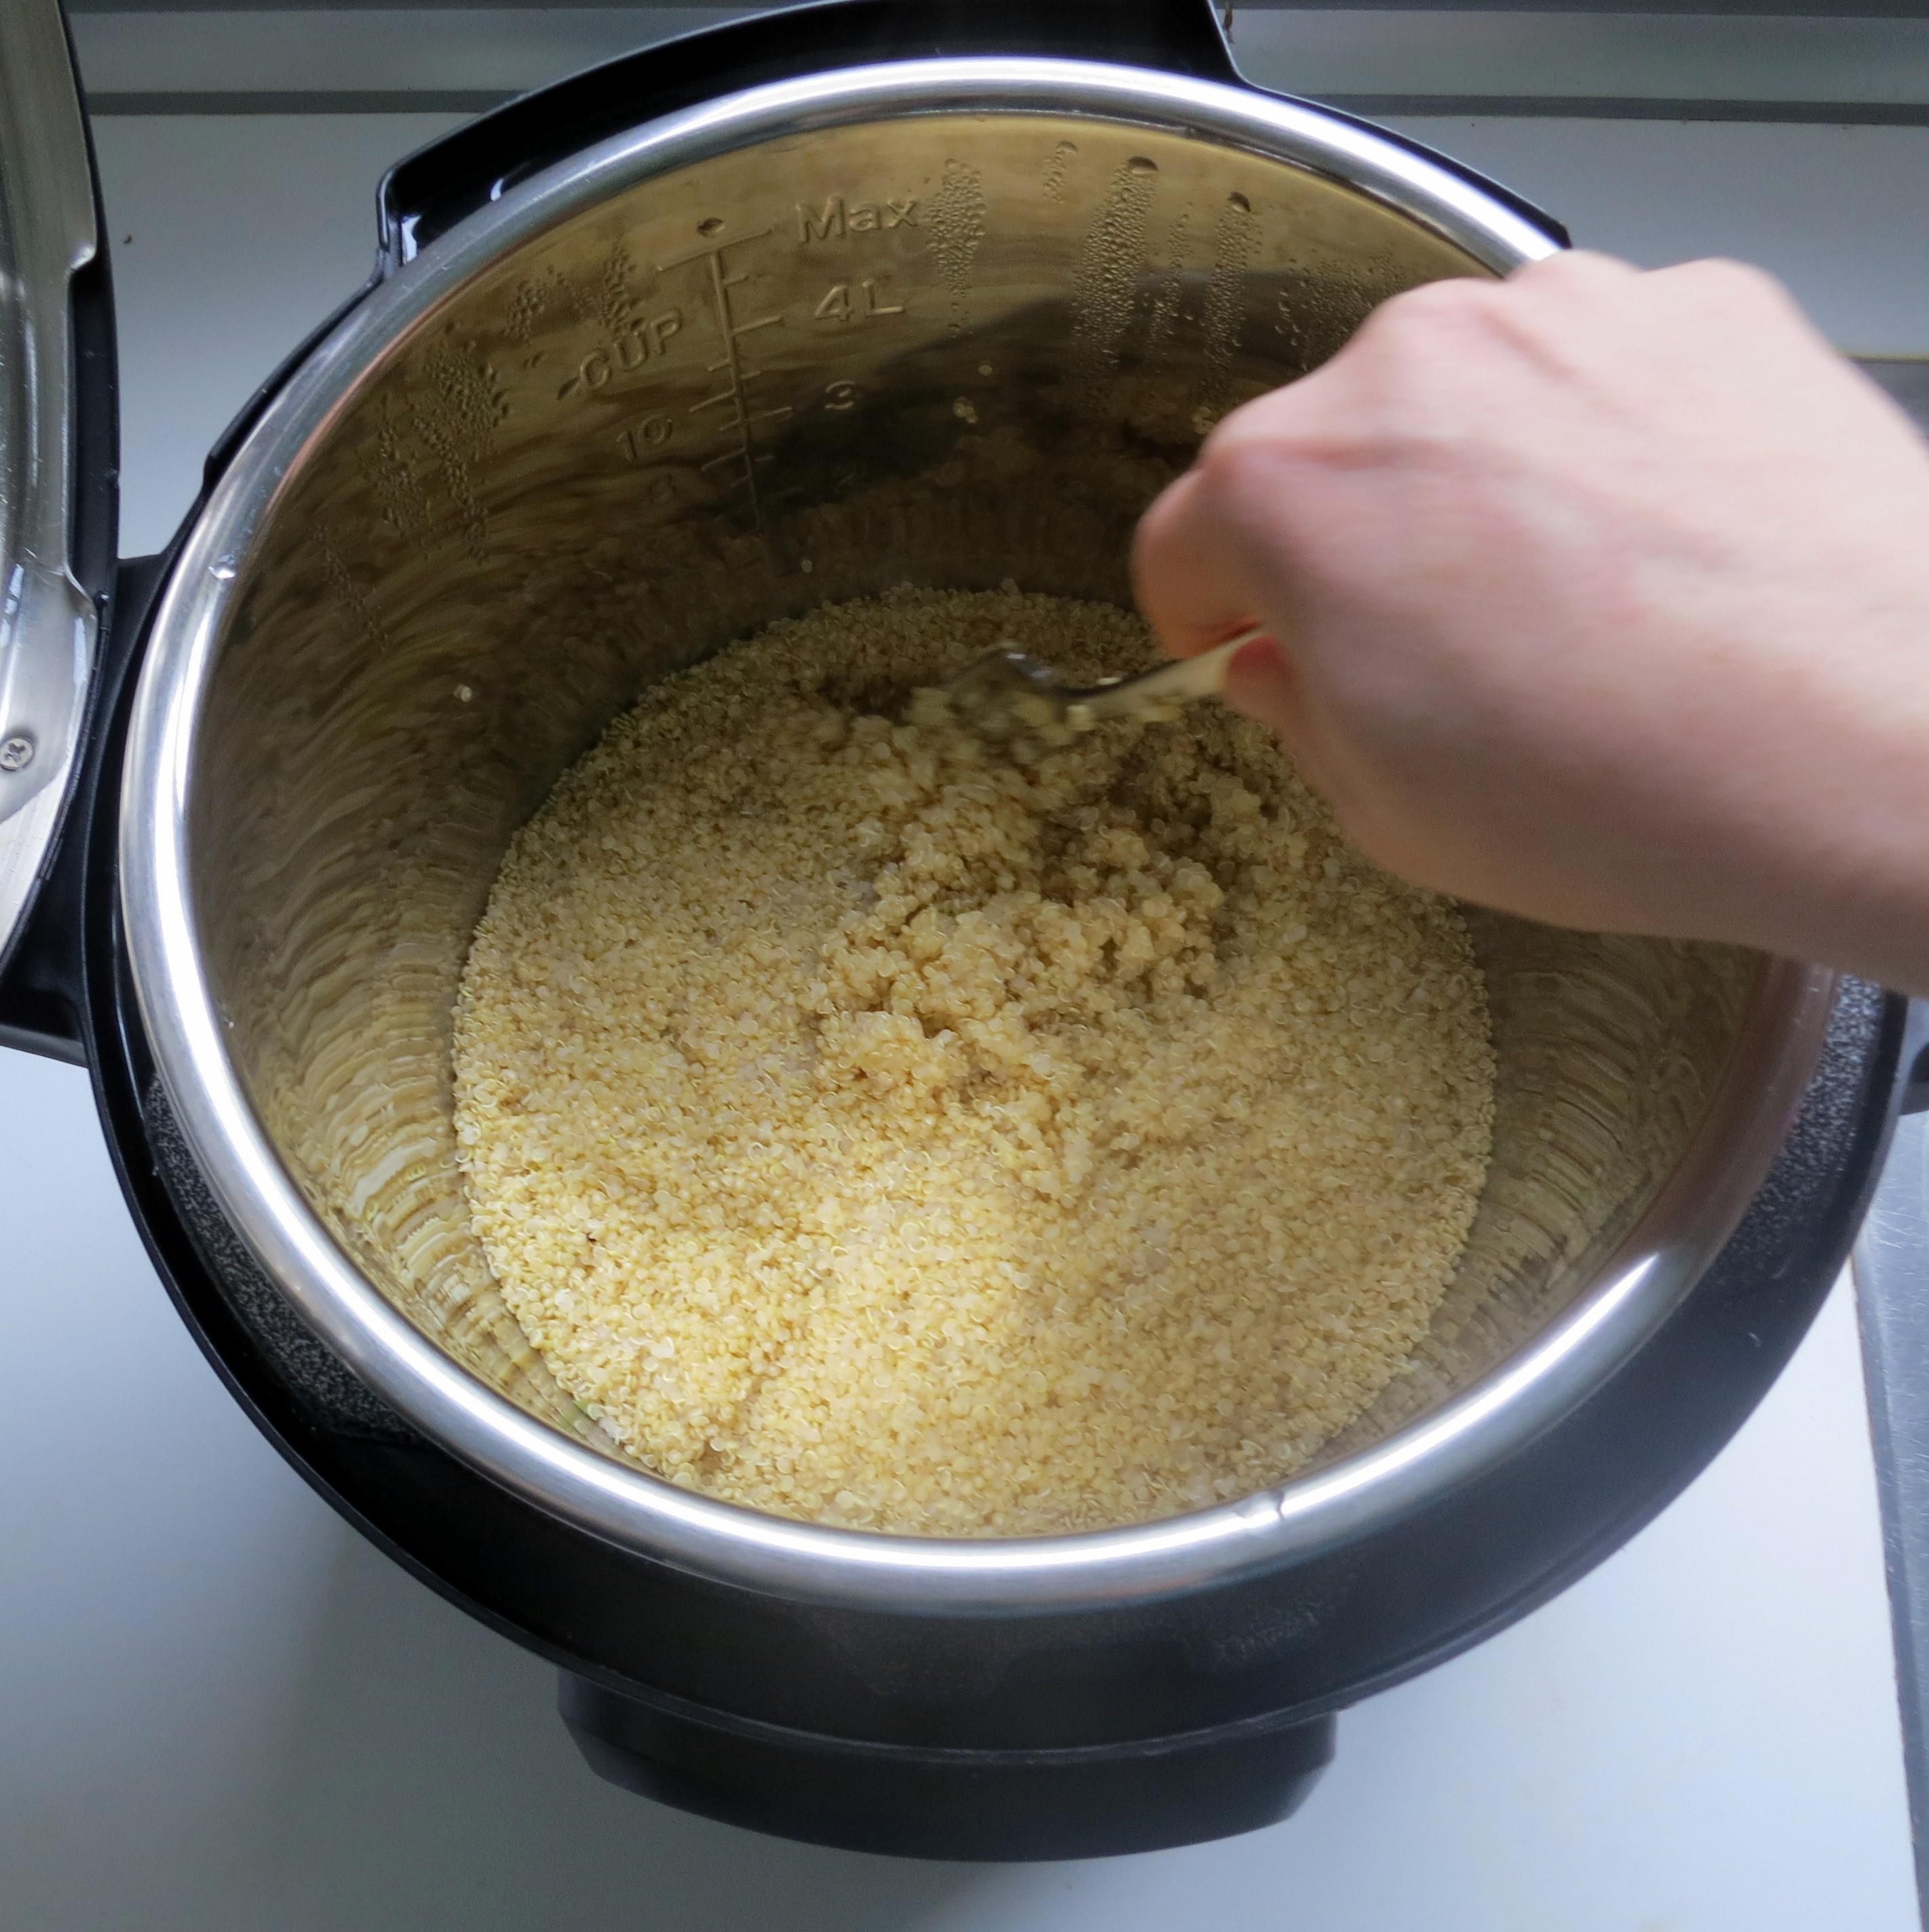 Fluffing pressure cooker quinoa.